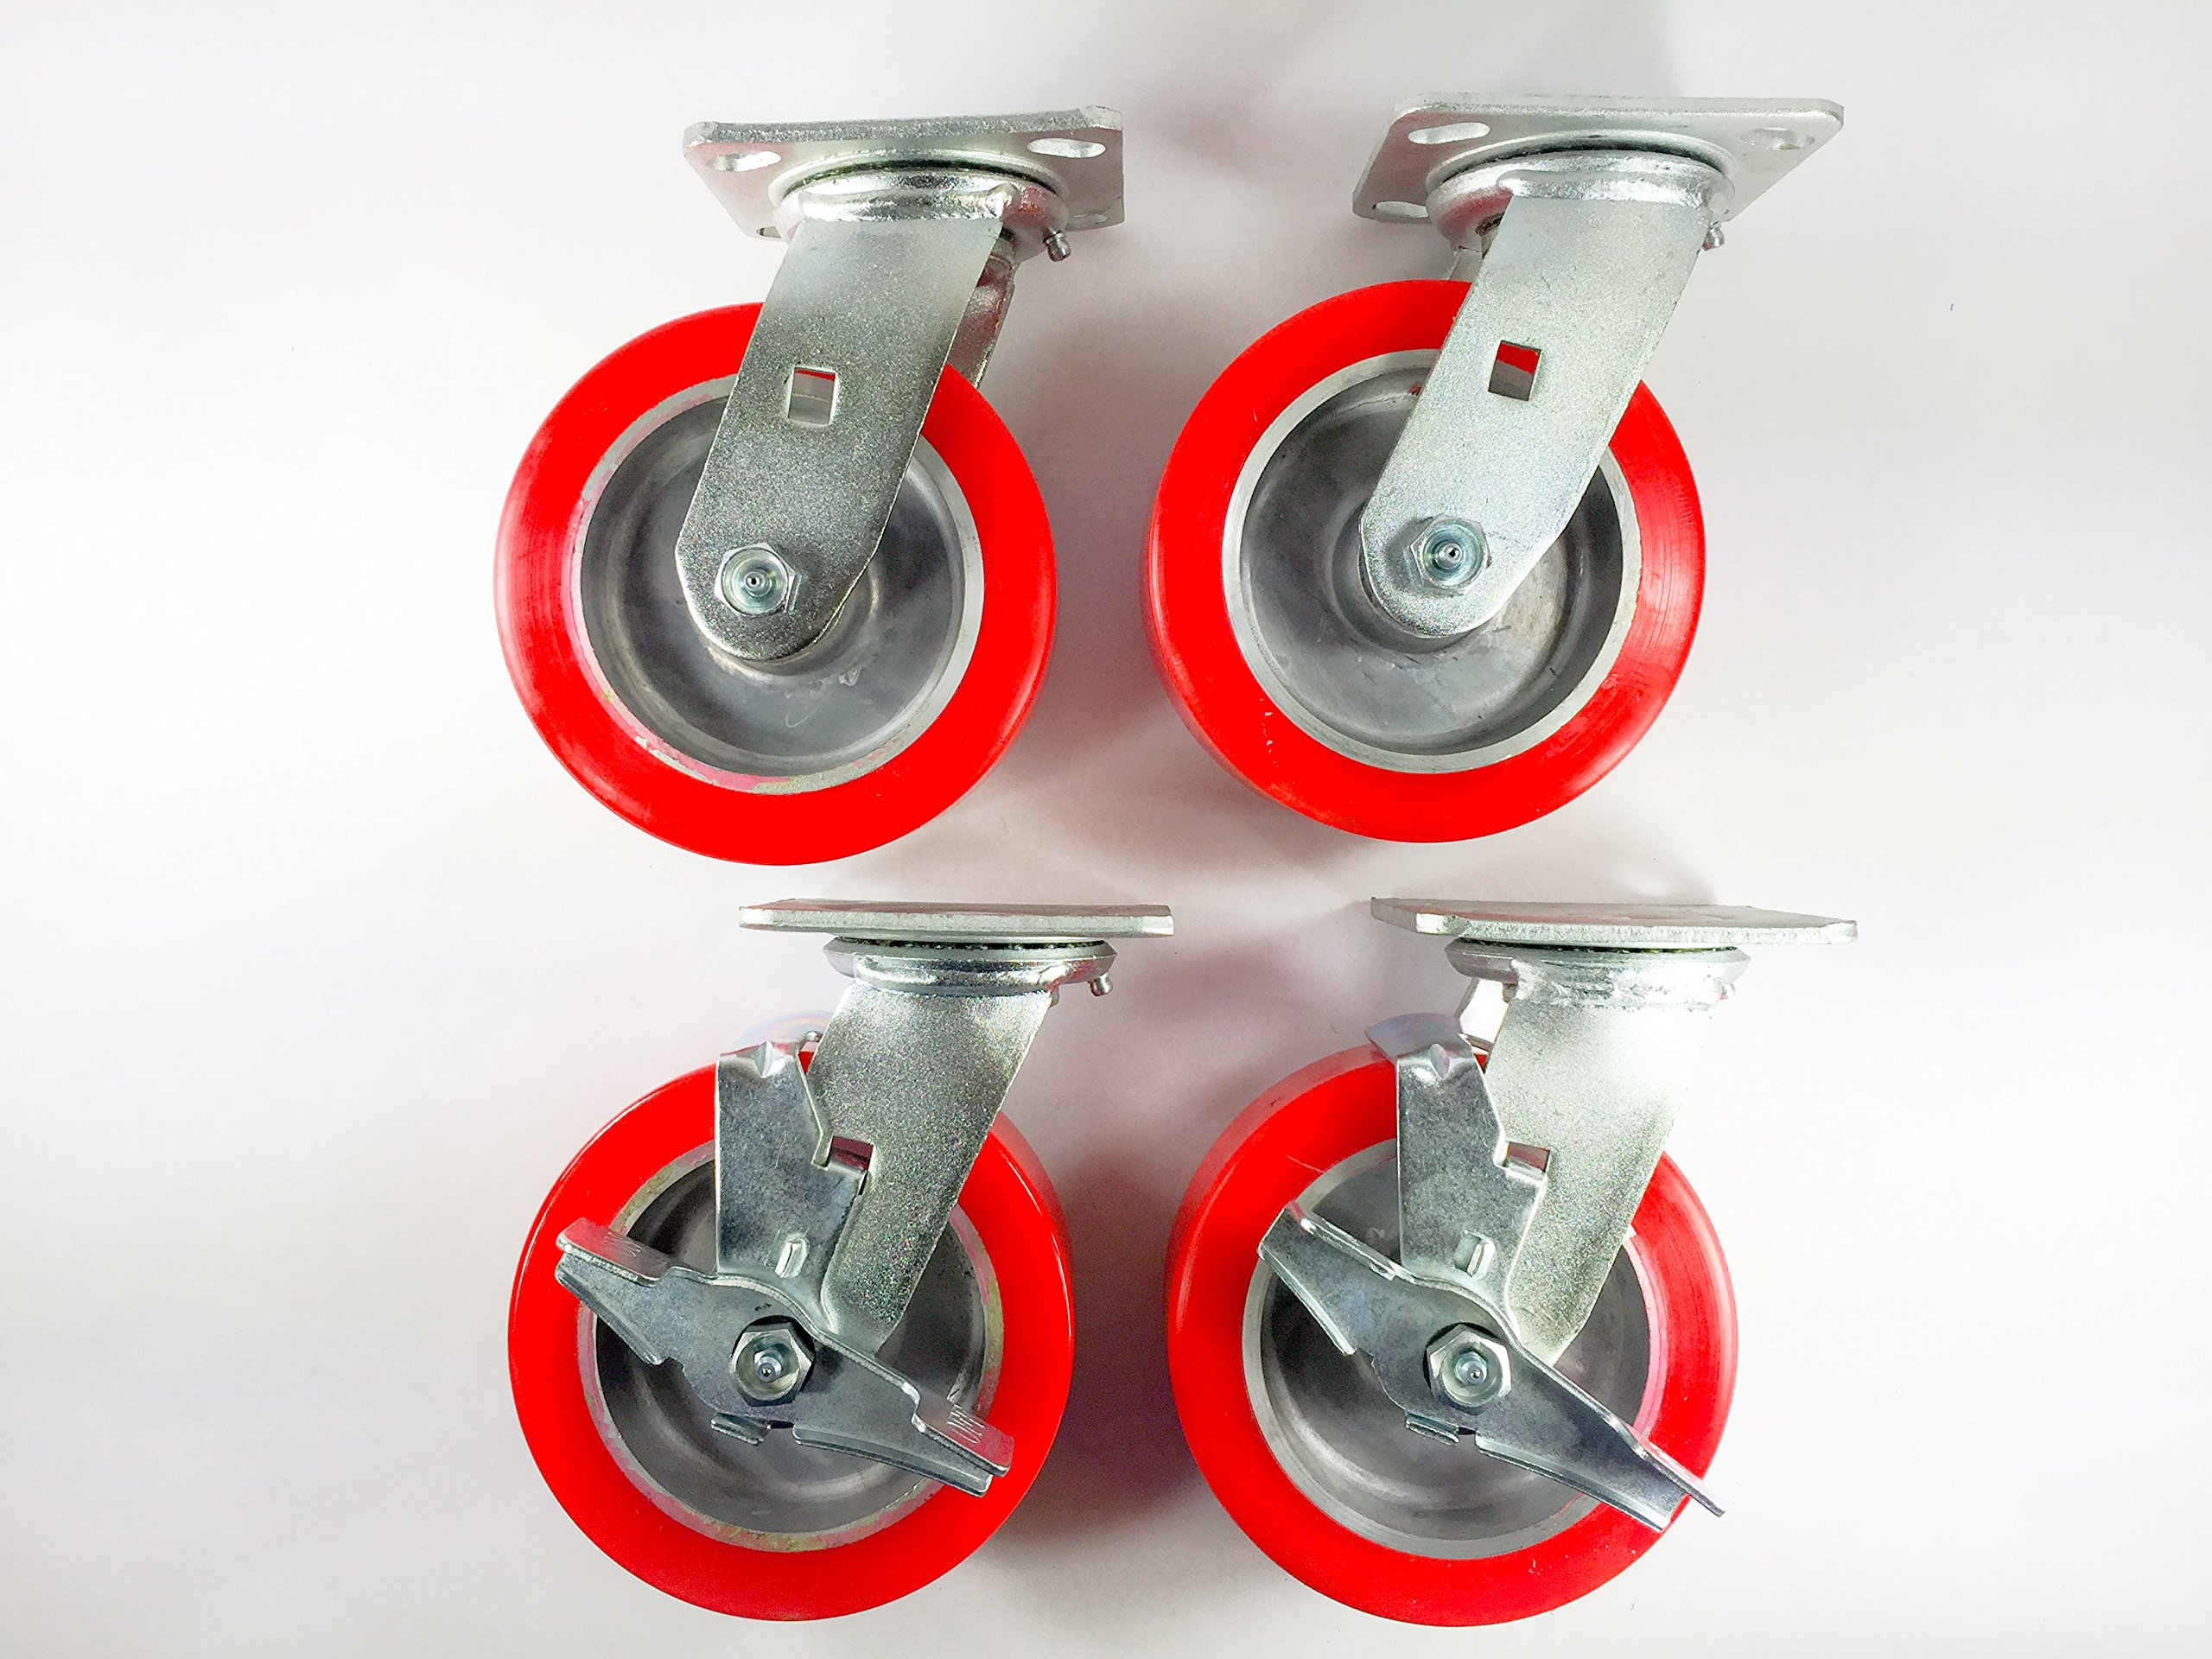 6'' X 2'' Polyurethane on Aluminum Caster - Swivel (2ea) & Swivel with Brake (2ea)